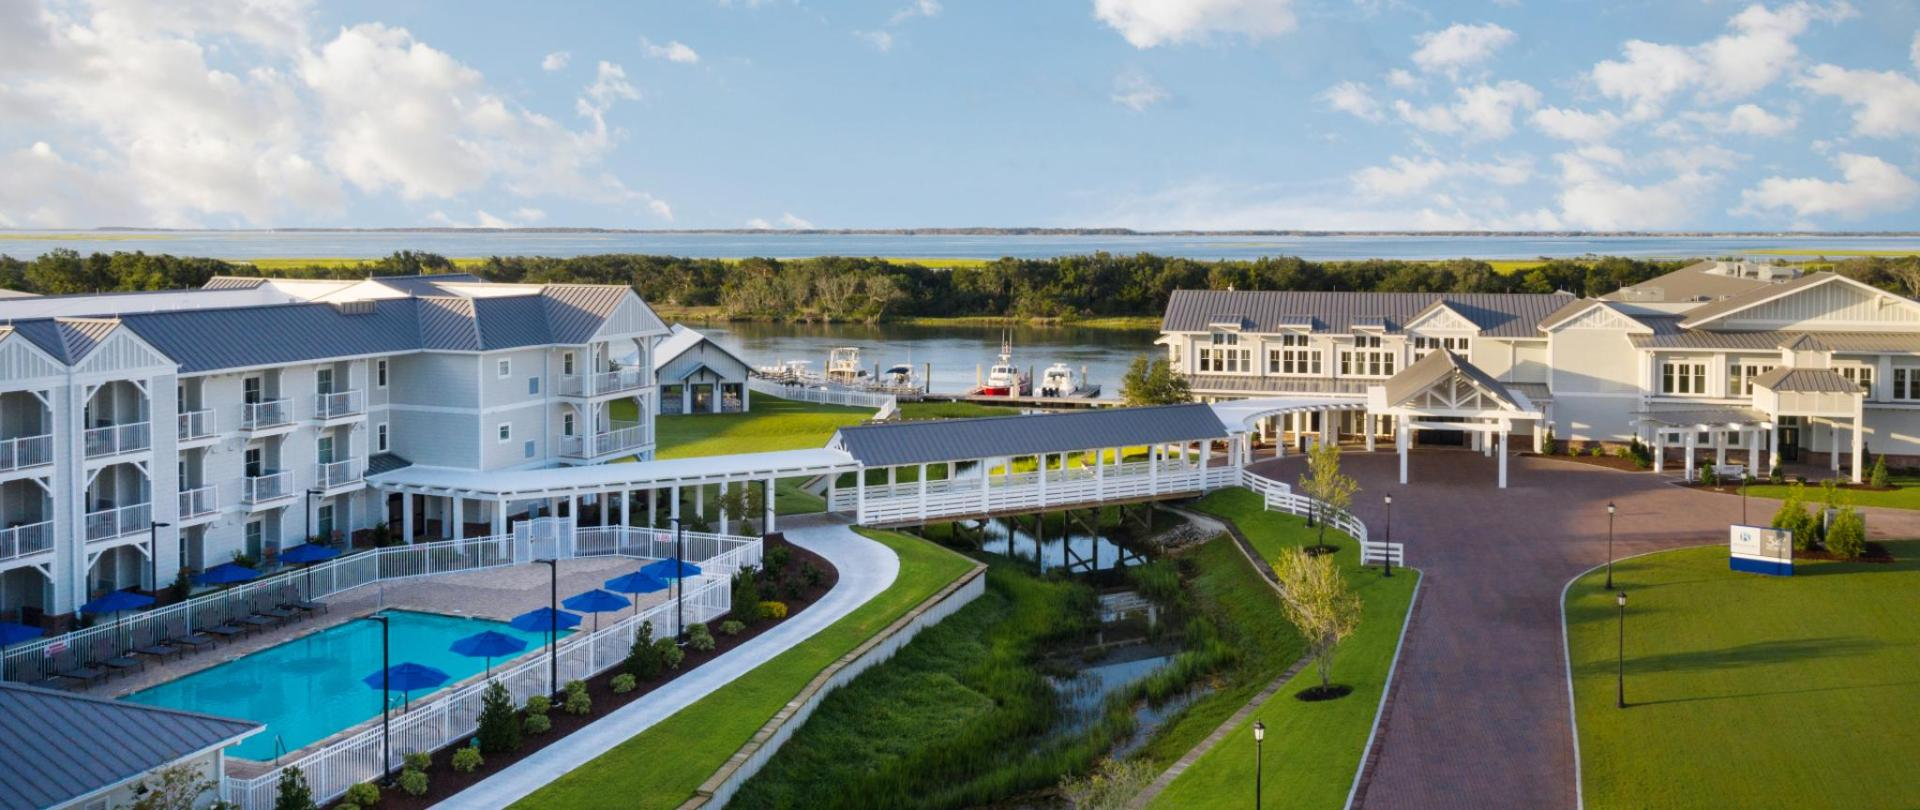 Ascend-Hotels-Beaufort-Hotel-NC-Beaufort-NC-1920x810.jpg